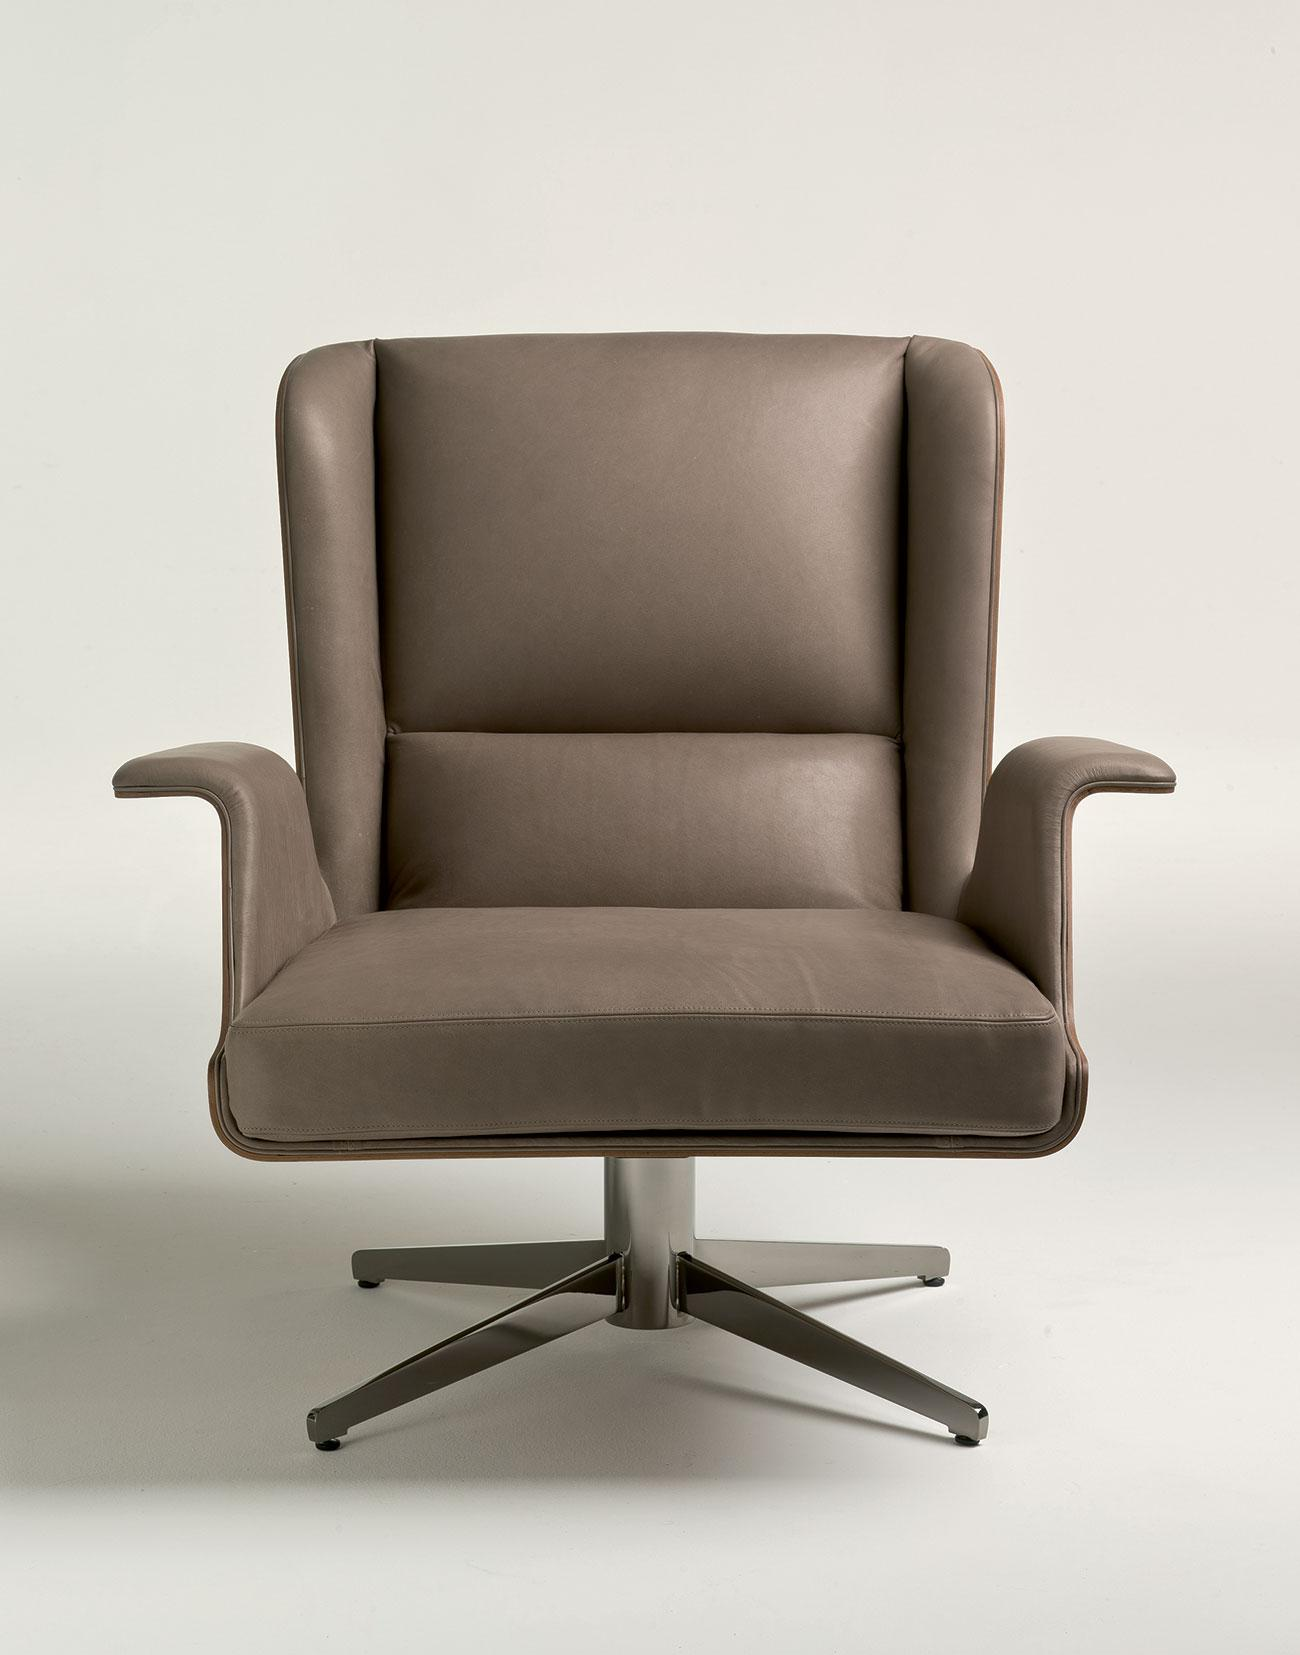 Garbo poltrona relax girevole italy dream design for Poltrona girevole design